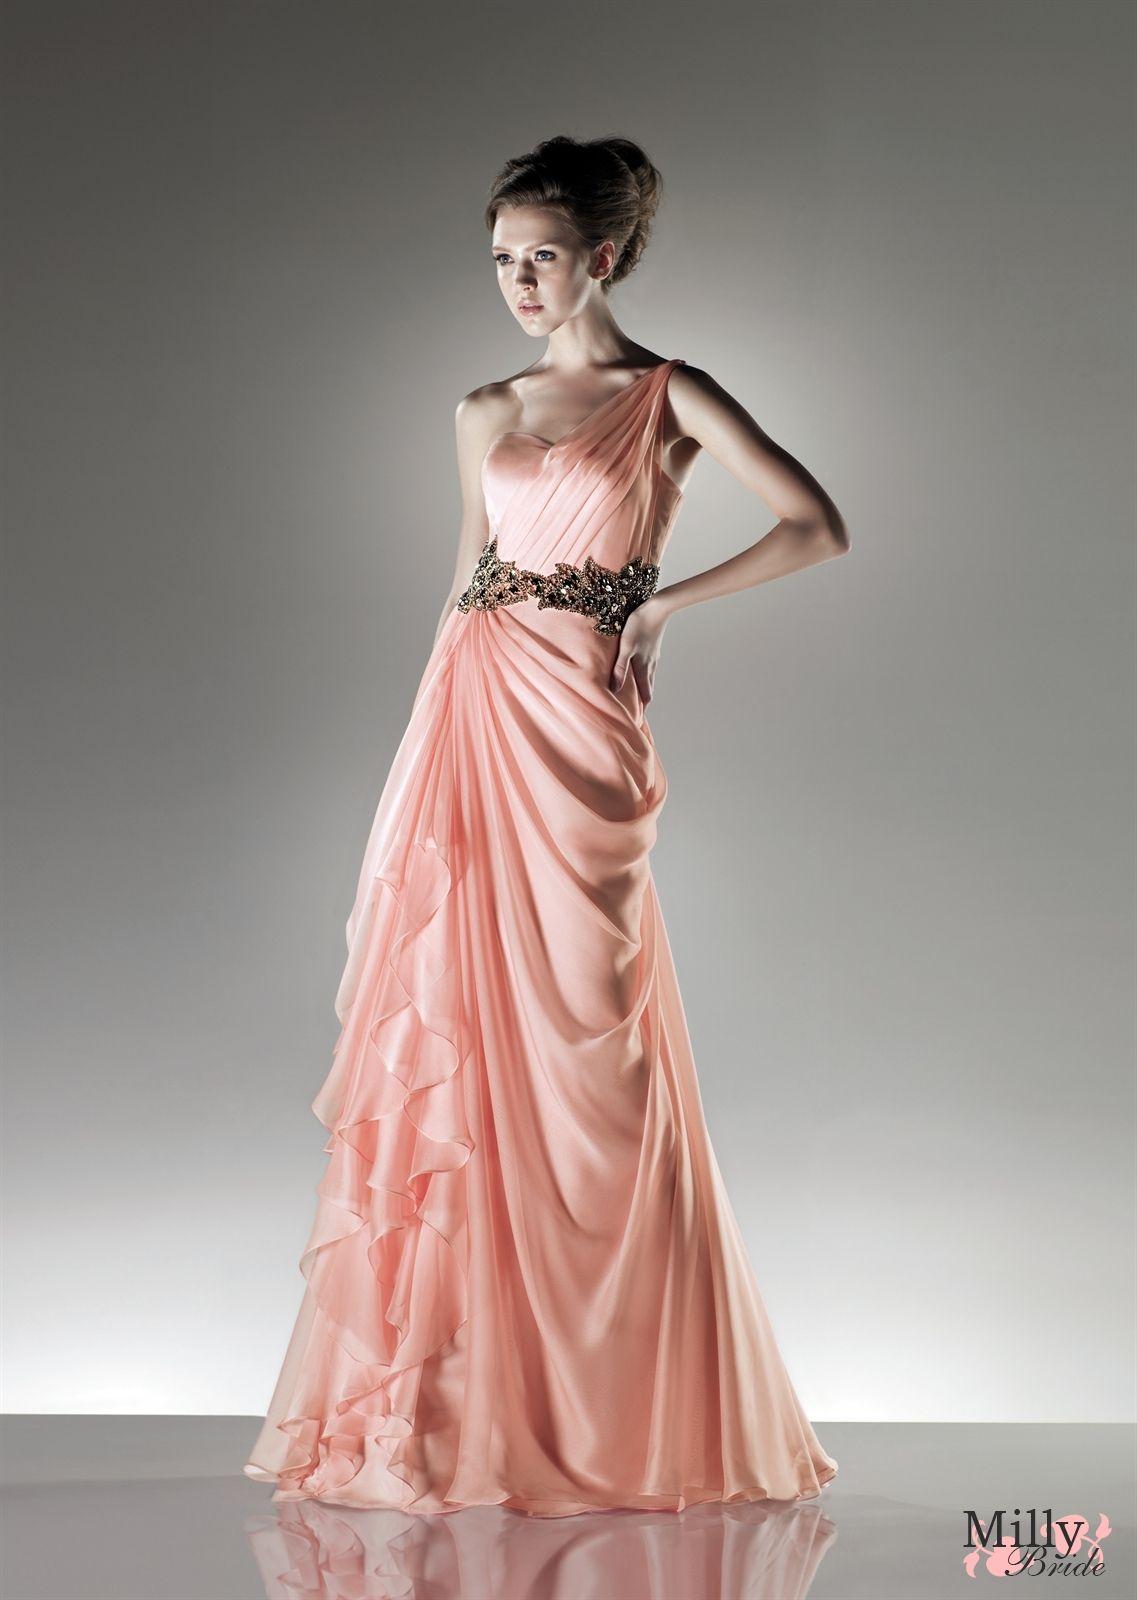 PROM PROM PROM | Dresses | Pinterest | Vestiditos, Trajes de prom y ...